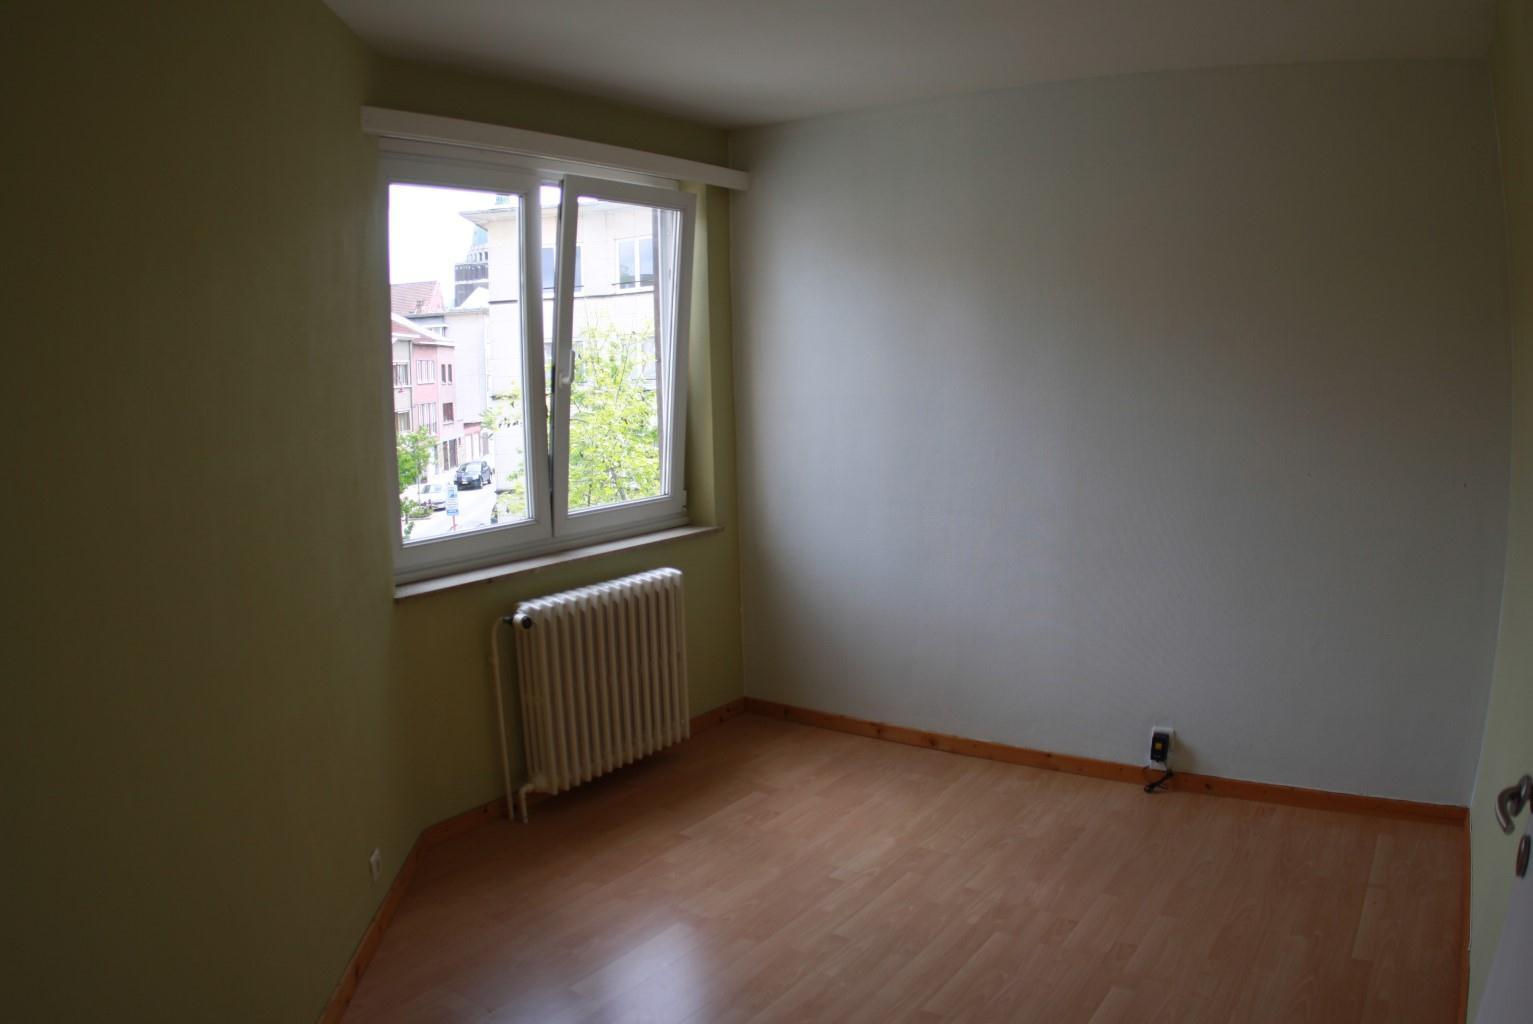 Flat - Berchem-Sainte-Agathe - #3149073-5